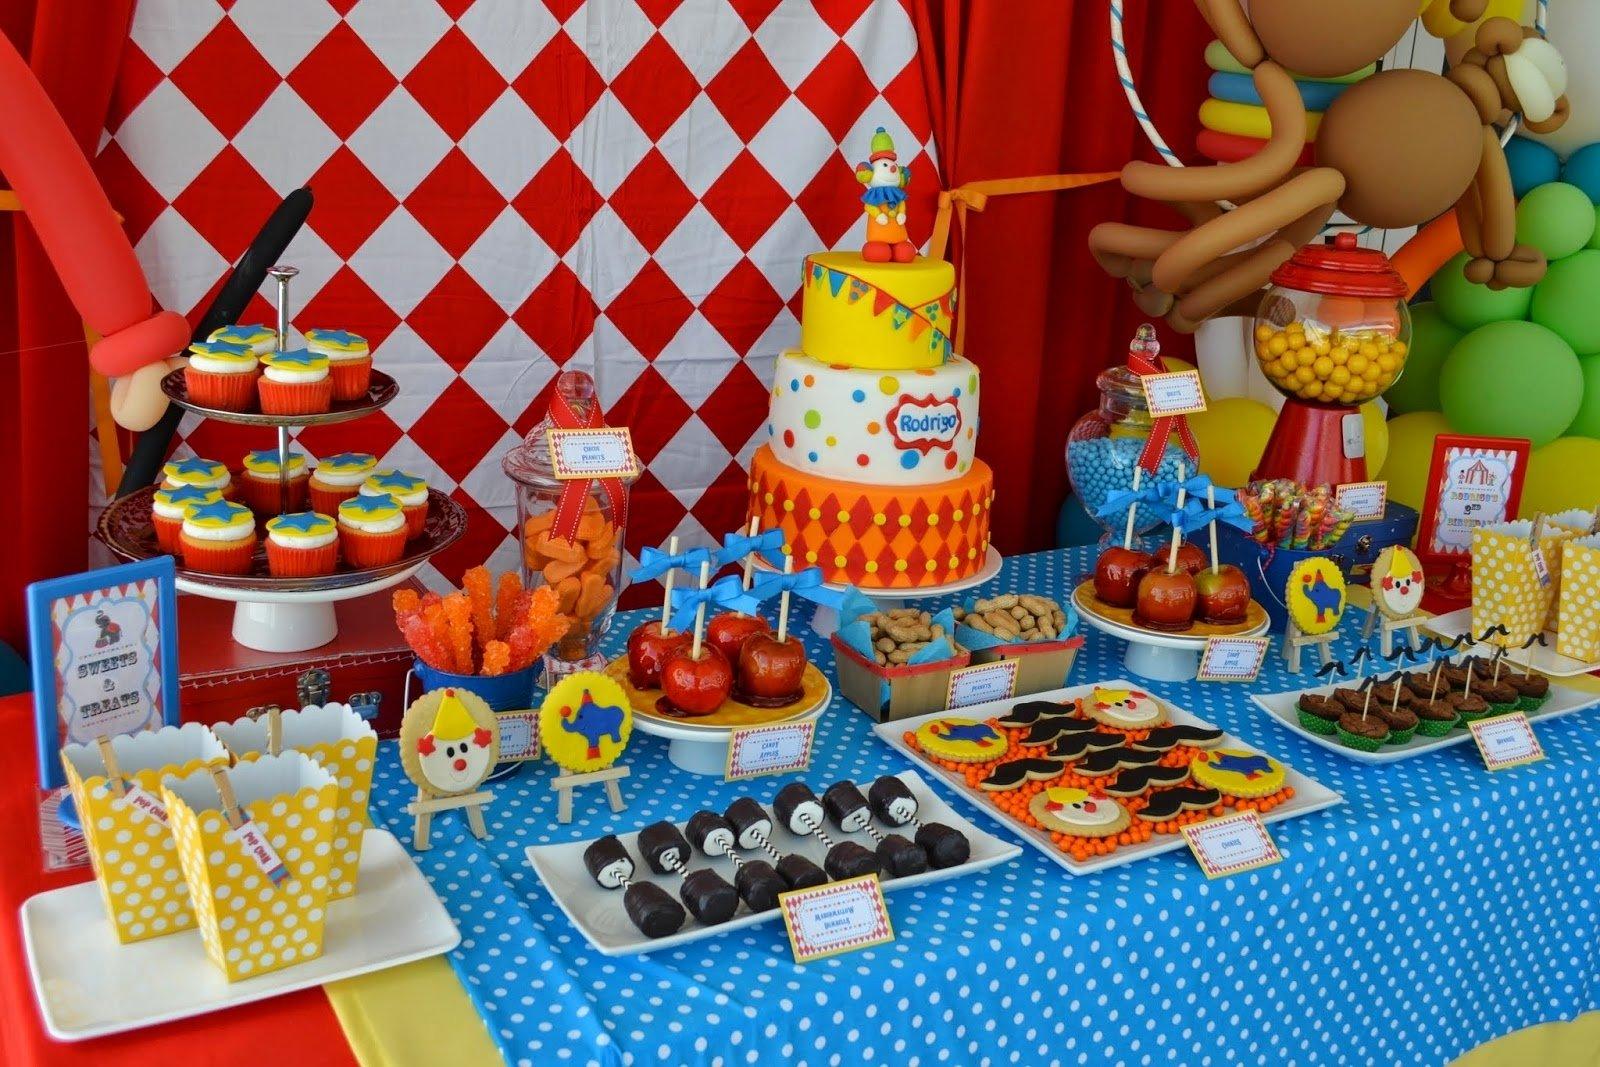 10 Stunning 9 Year Old Boy Birthday Party Ideas Themes 3